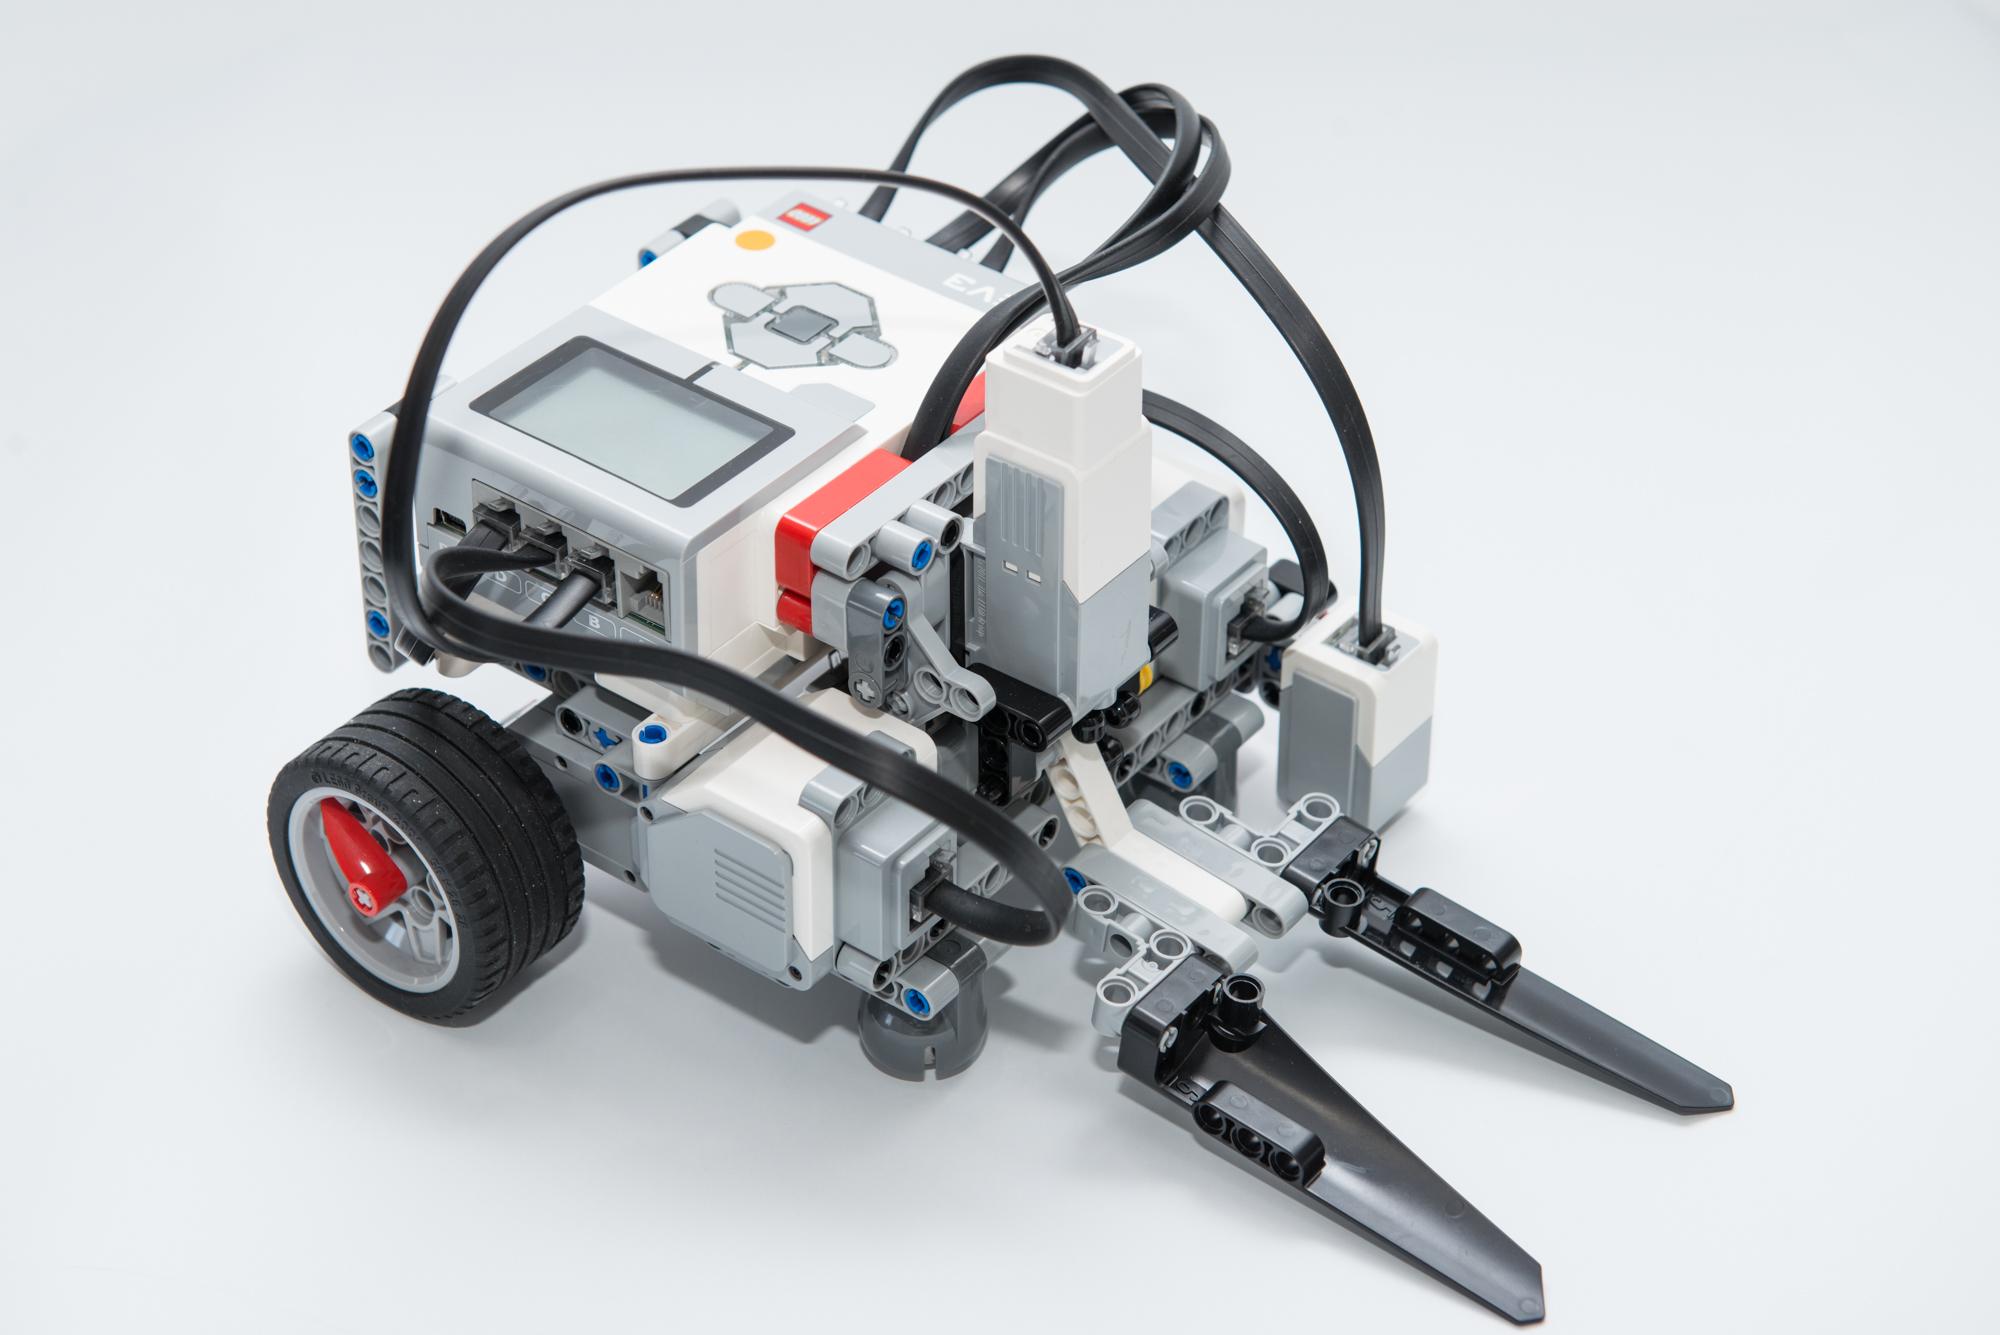 LEGO(EV3) WRO2017練習ロボットを作る